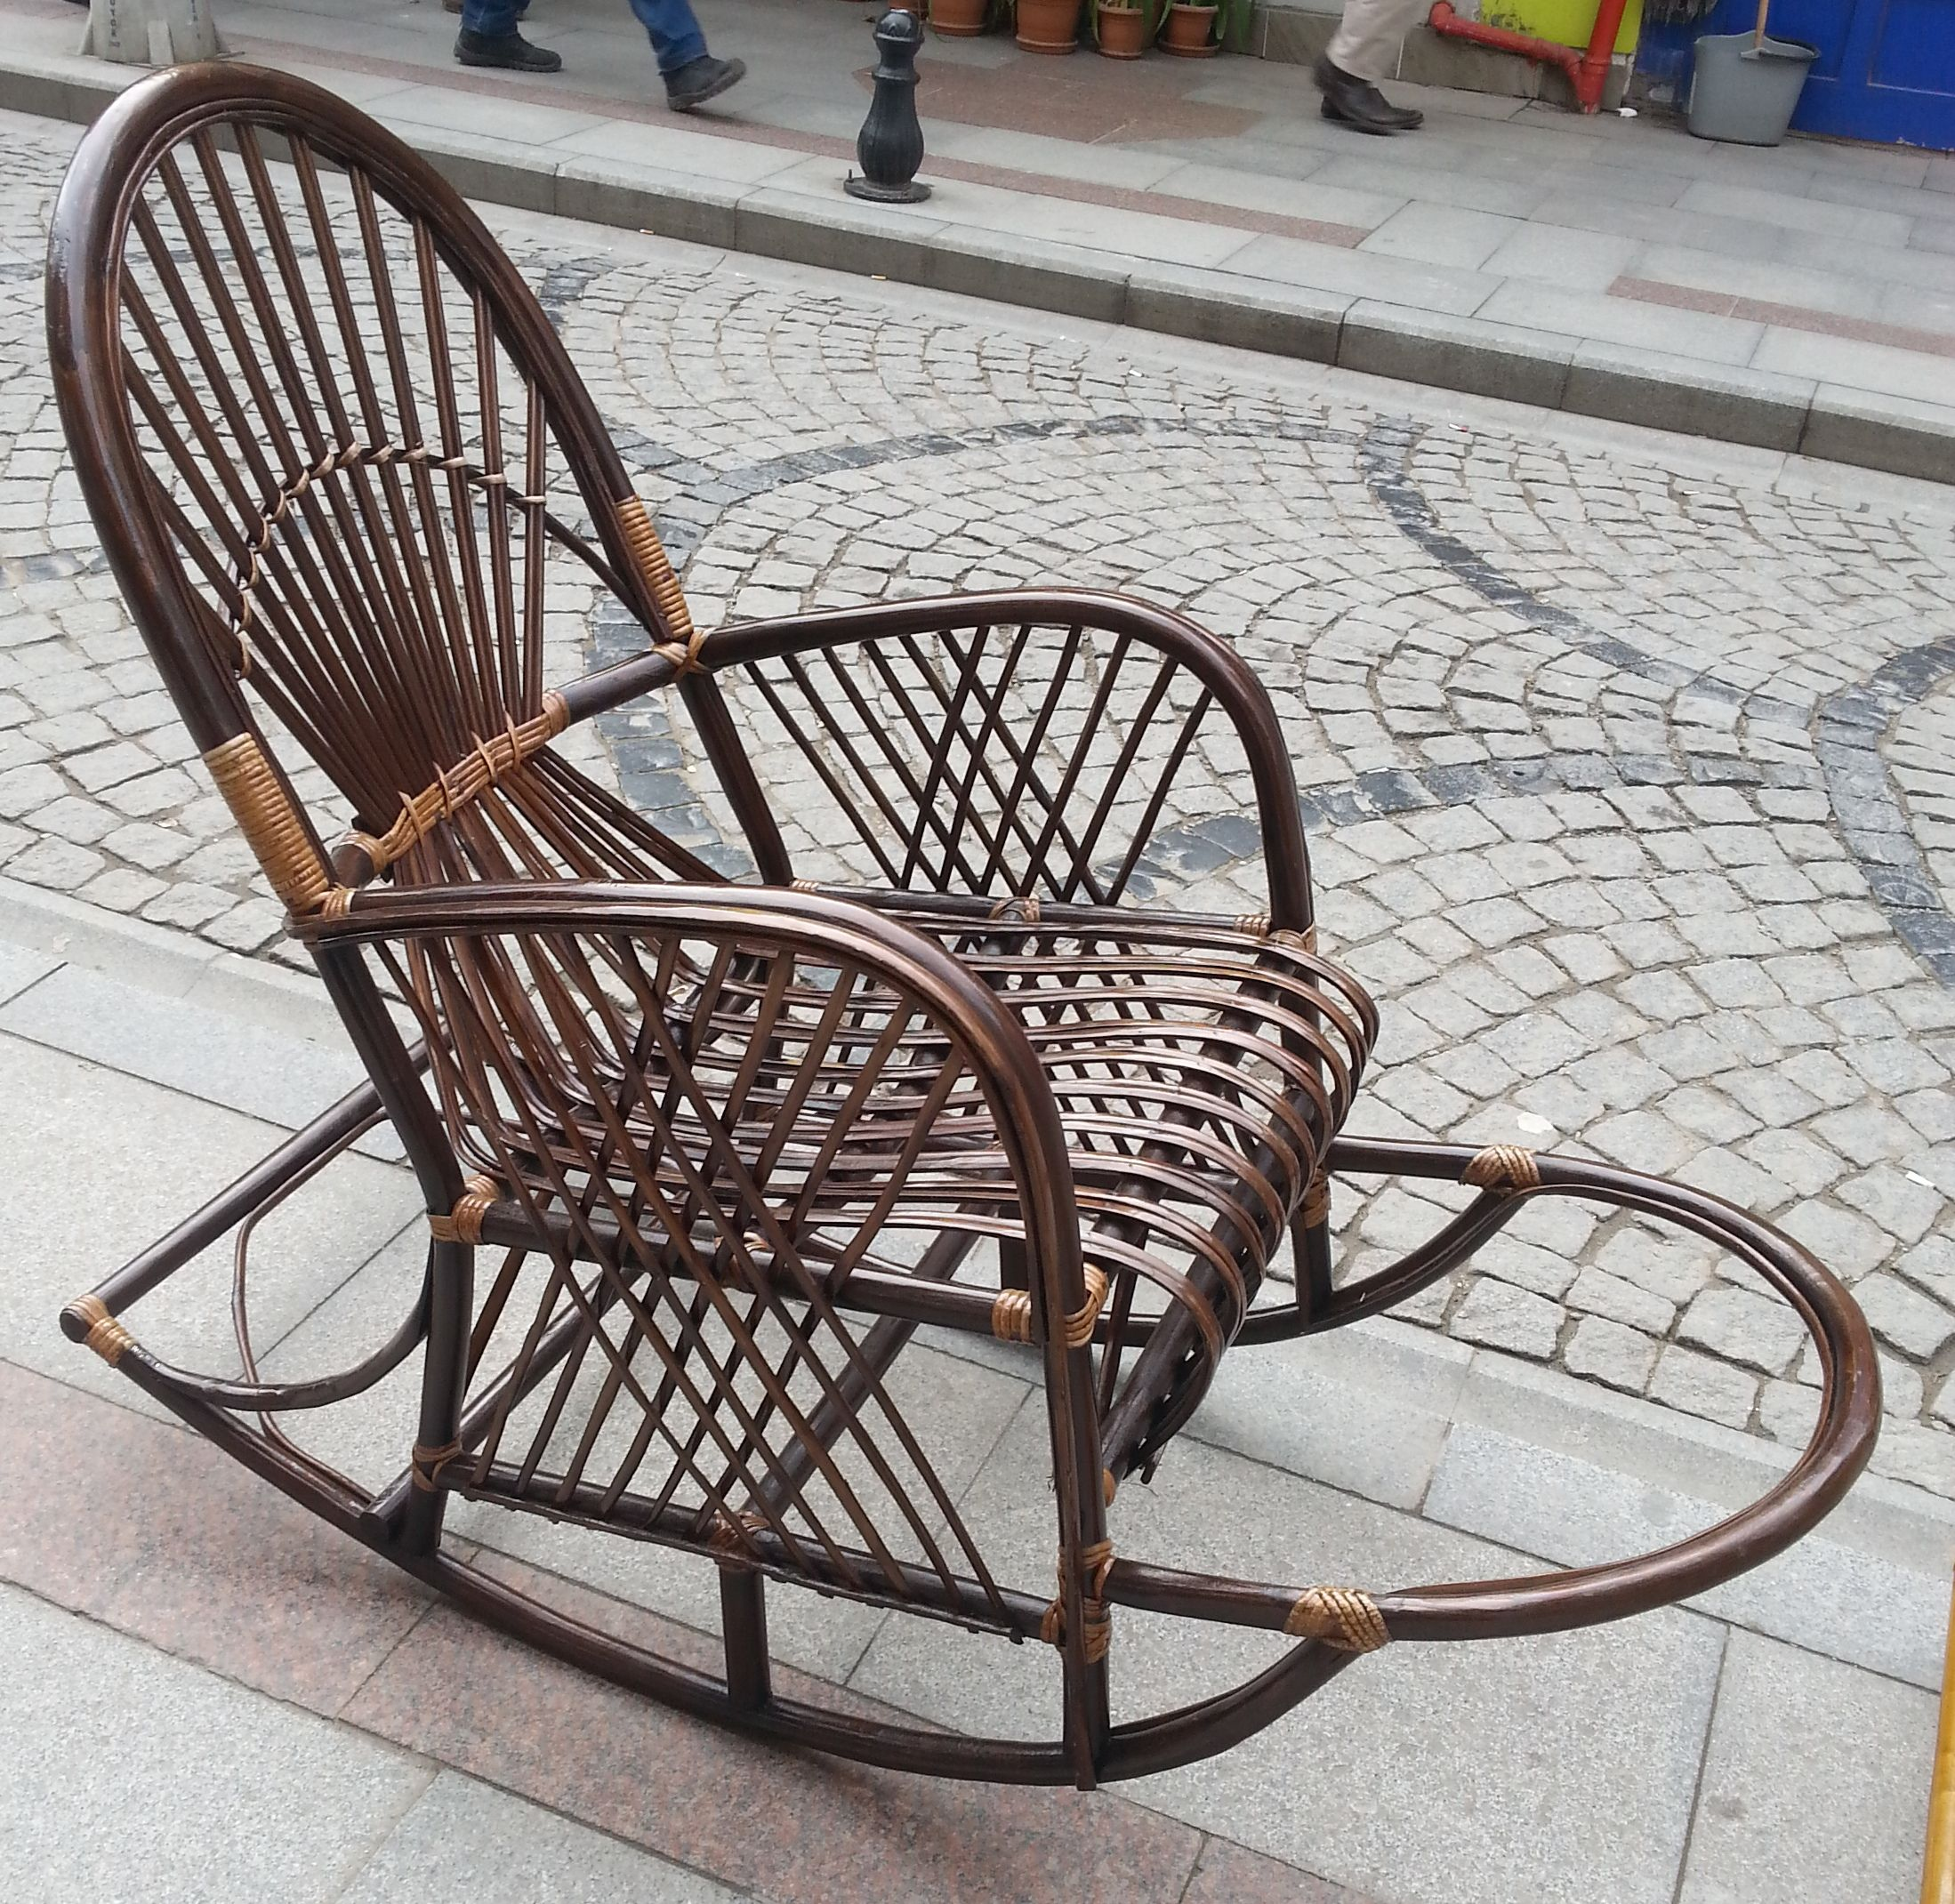 Karamursel Sepeti Adli Kullanicinin Bambu Sallanan Sandalyeler Panosundaki Pin Sandalye Bambu